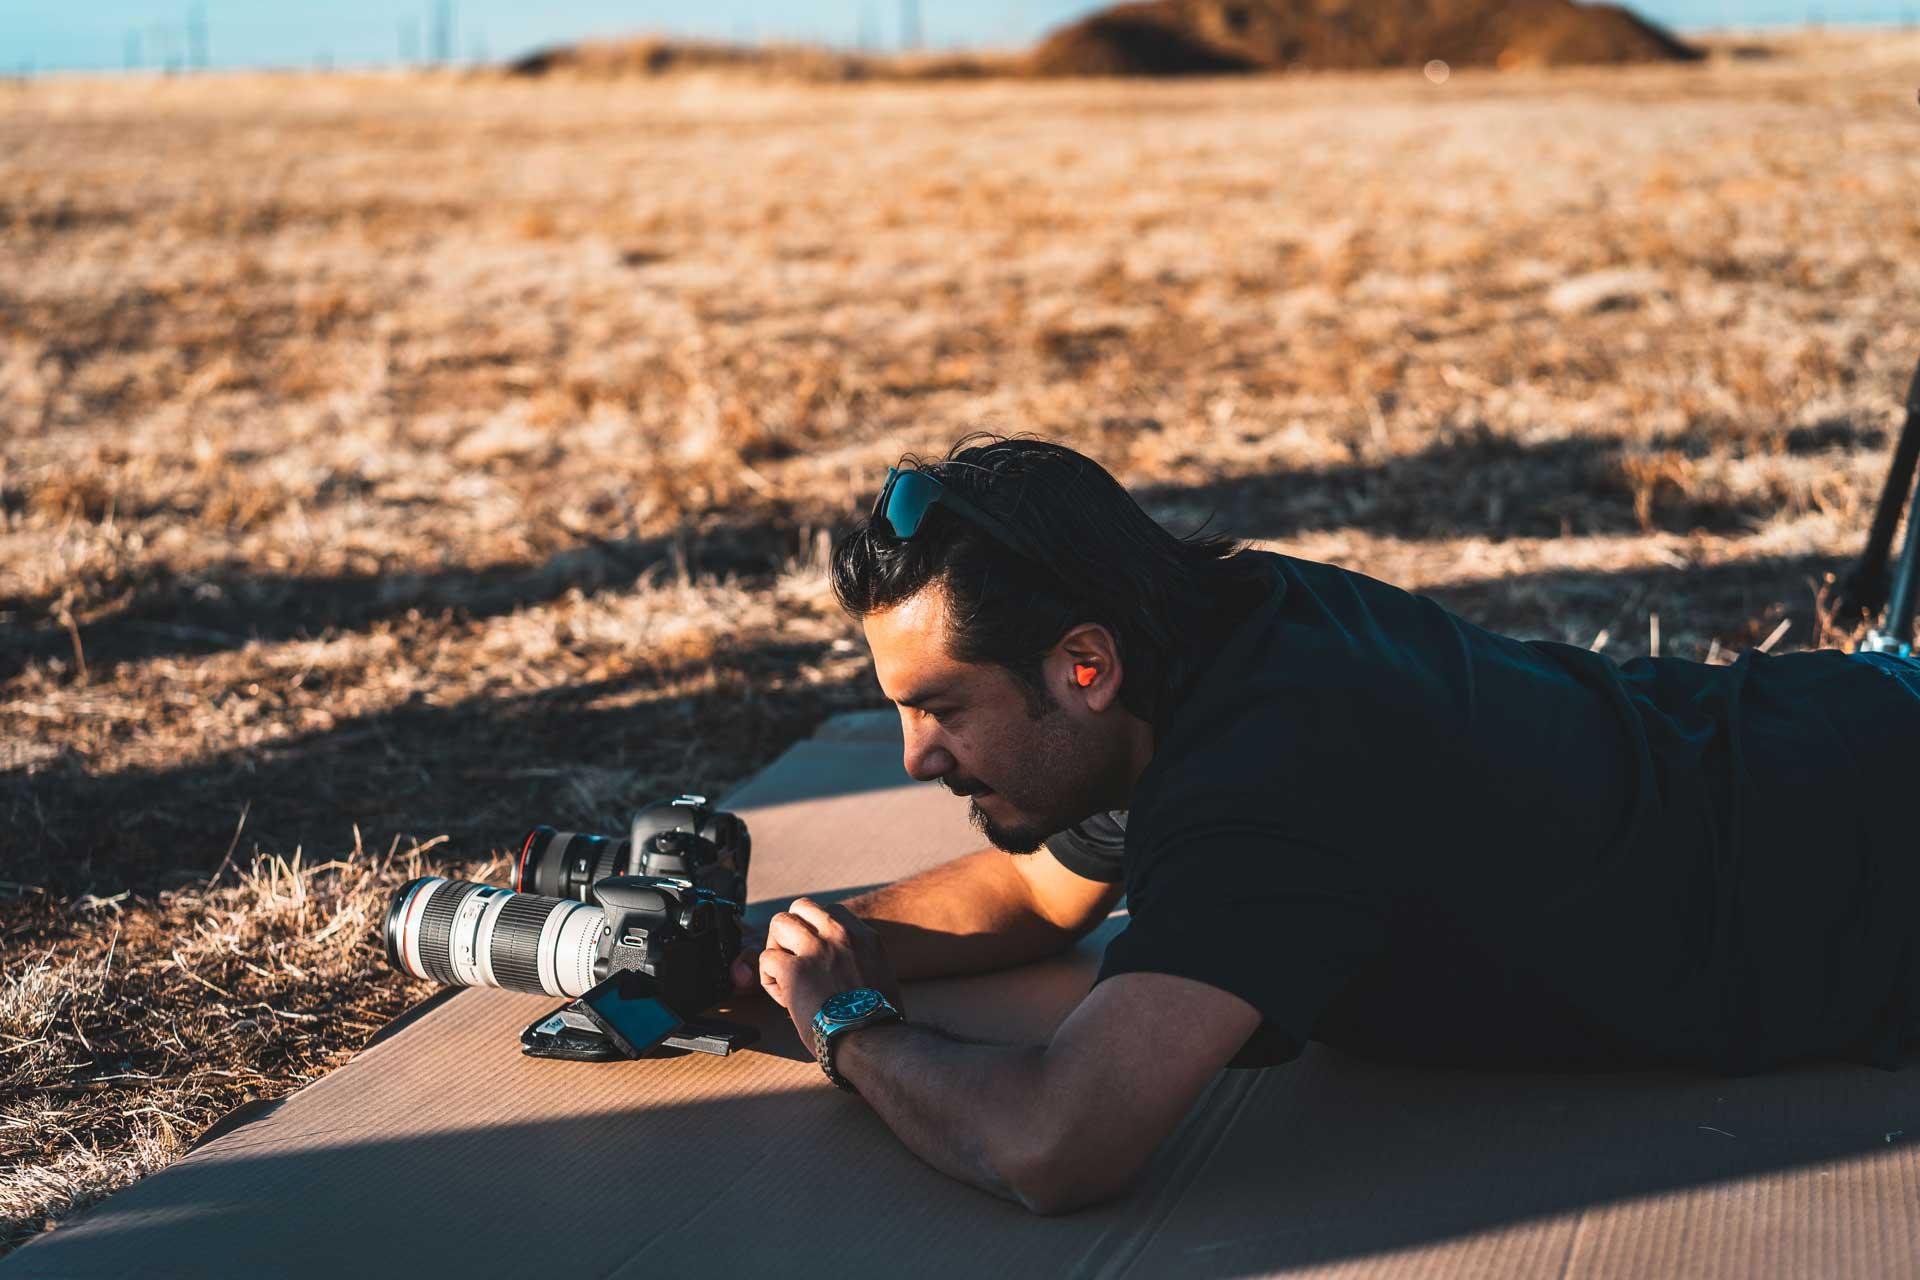 creative_cannon_video_shoot-5